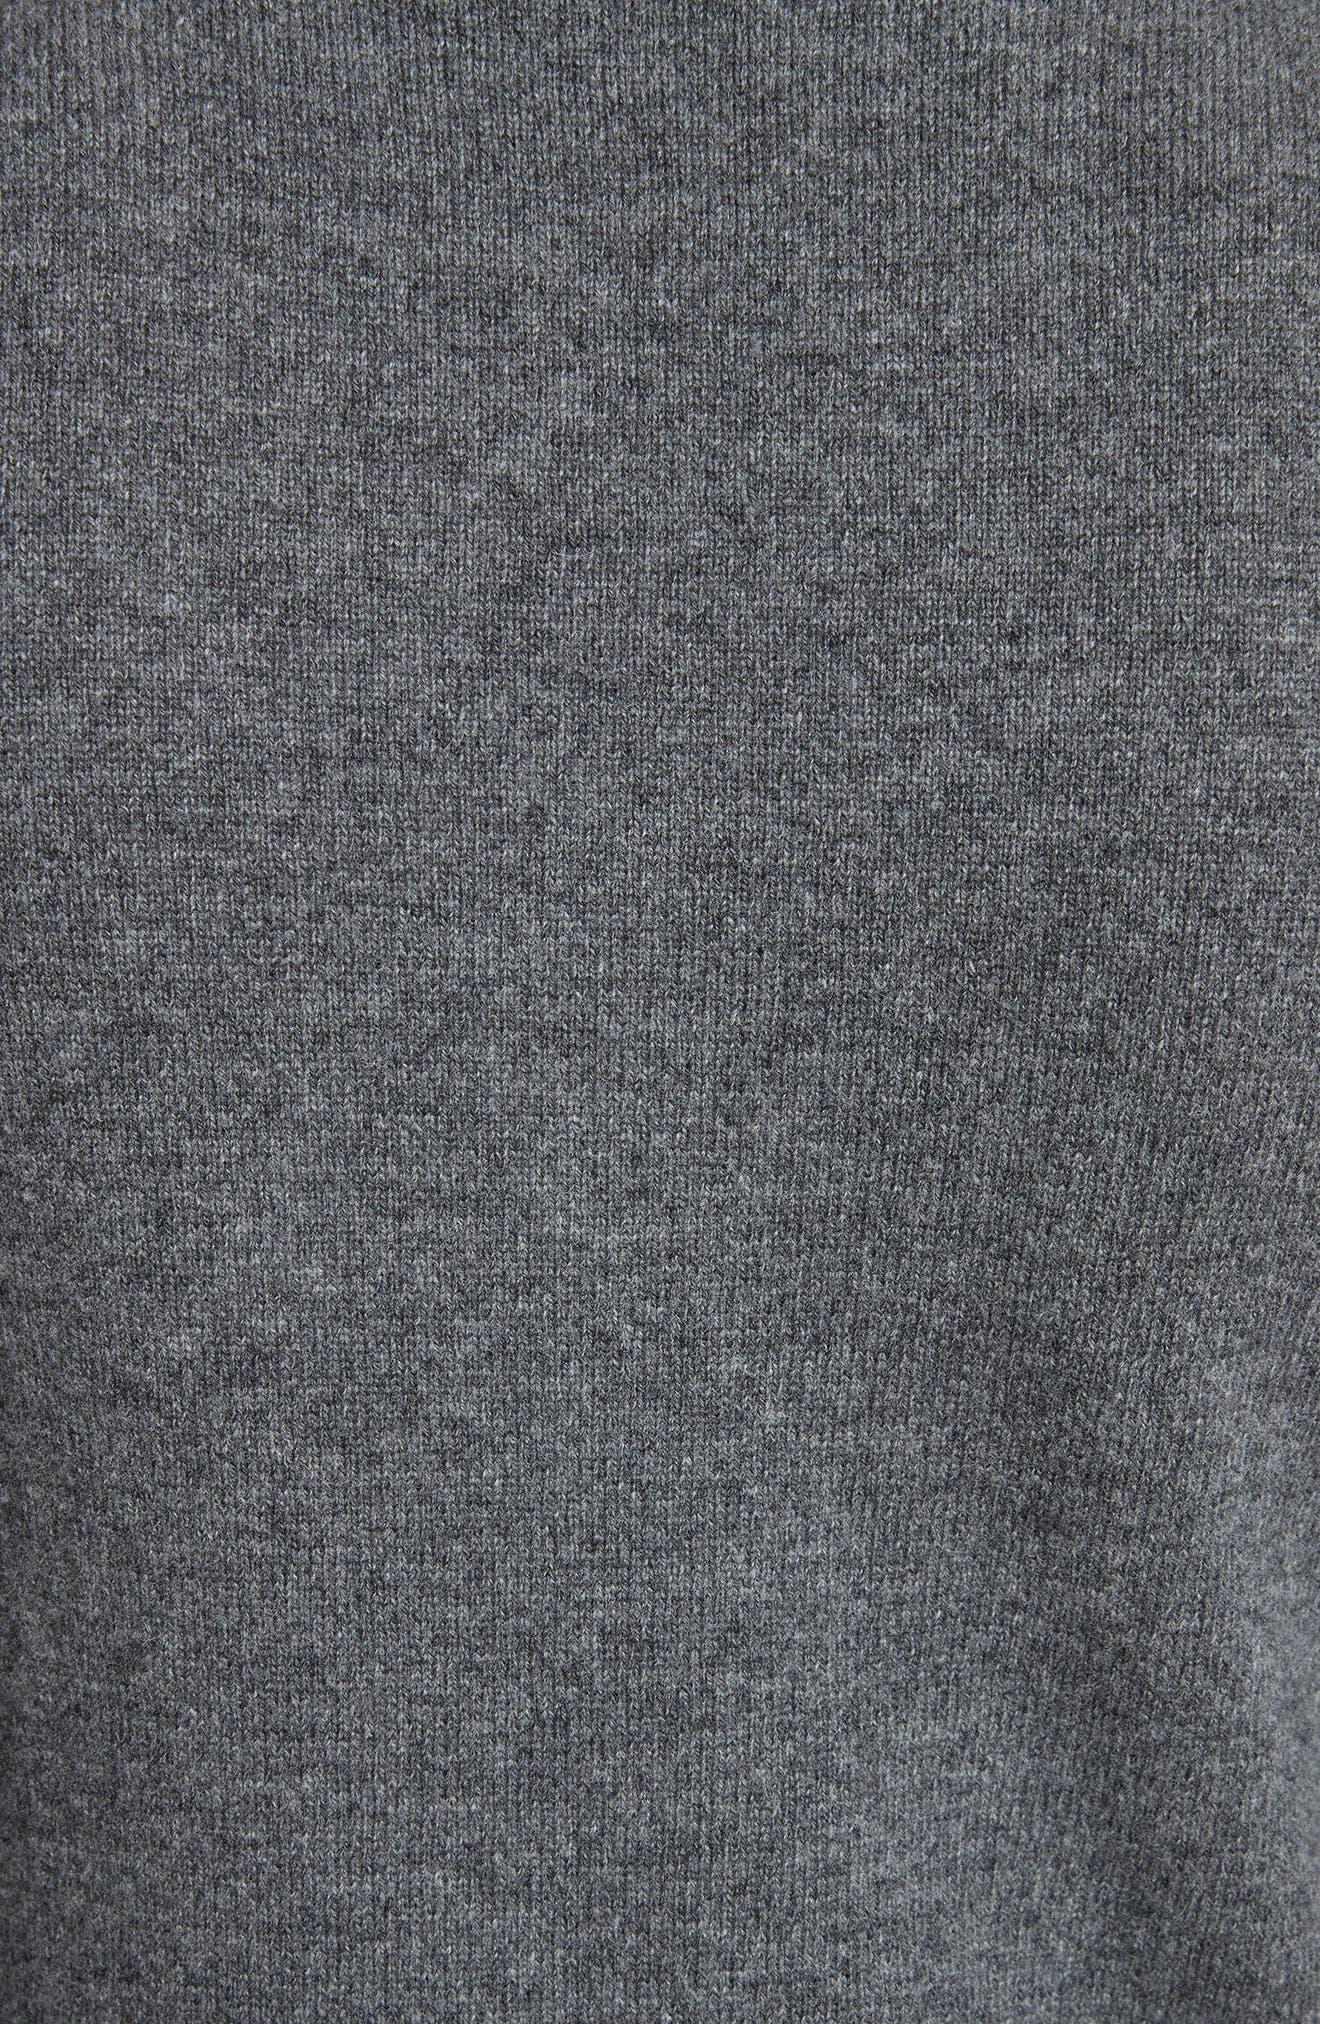 Comme des Garçons PLAY Wool V-Neck Sweater,                             Alternate thumbnail 5, color,                             Grey